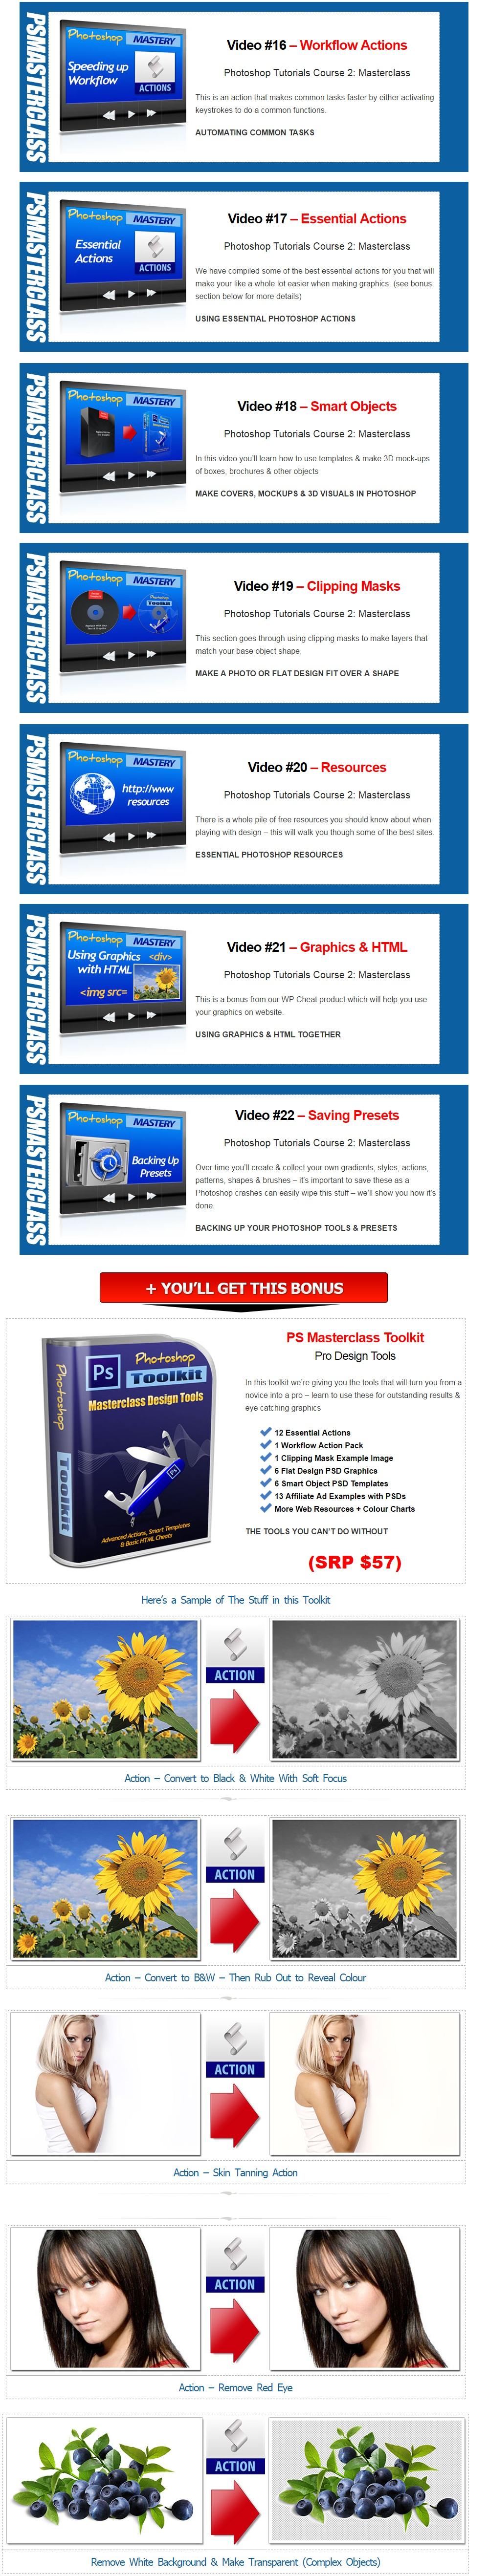 PS Masterclass 2016 Course 2